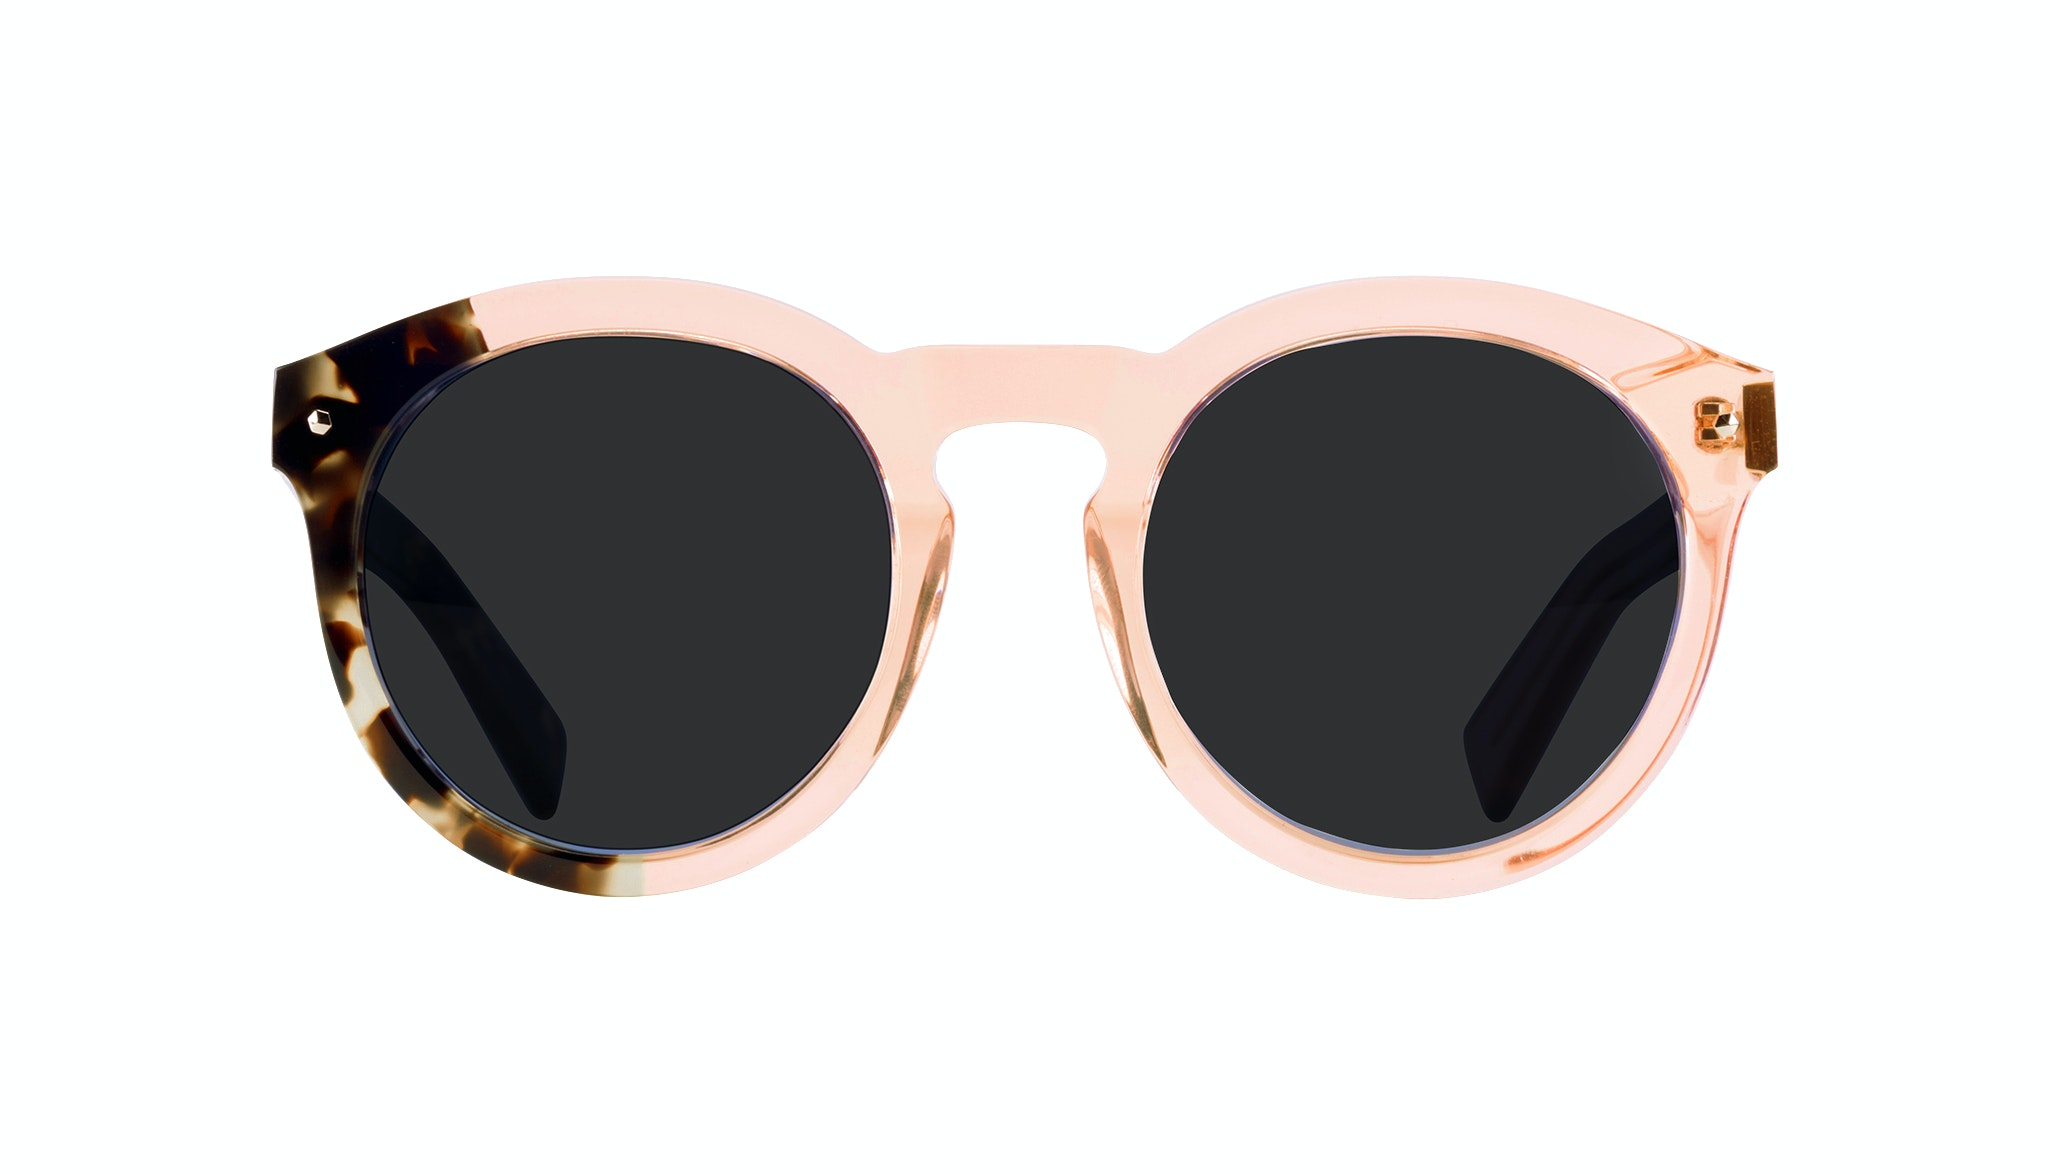 Affordable Fashion Glasses Round Sunglasses Women Mood Peach